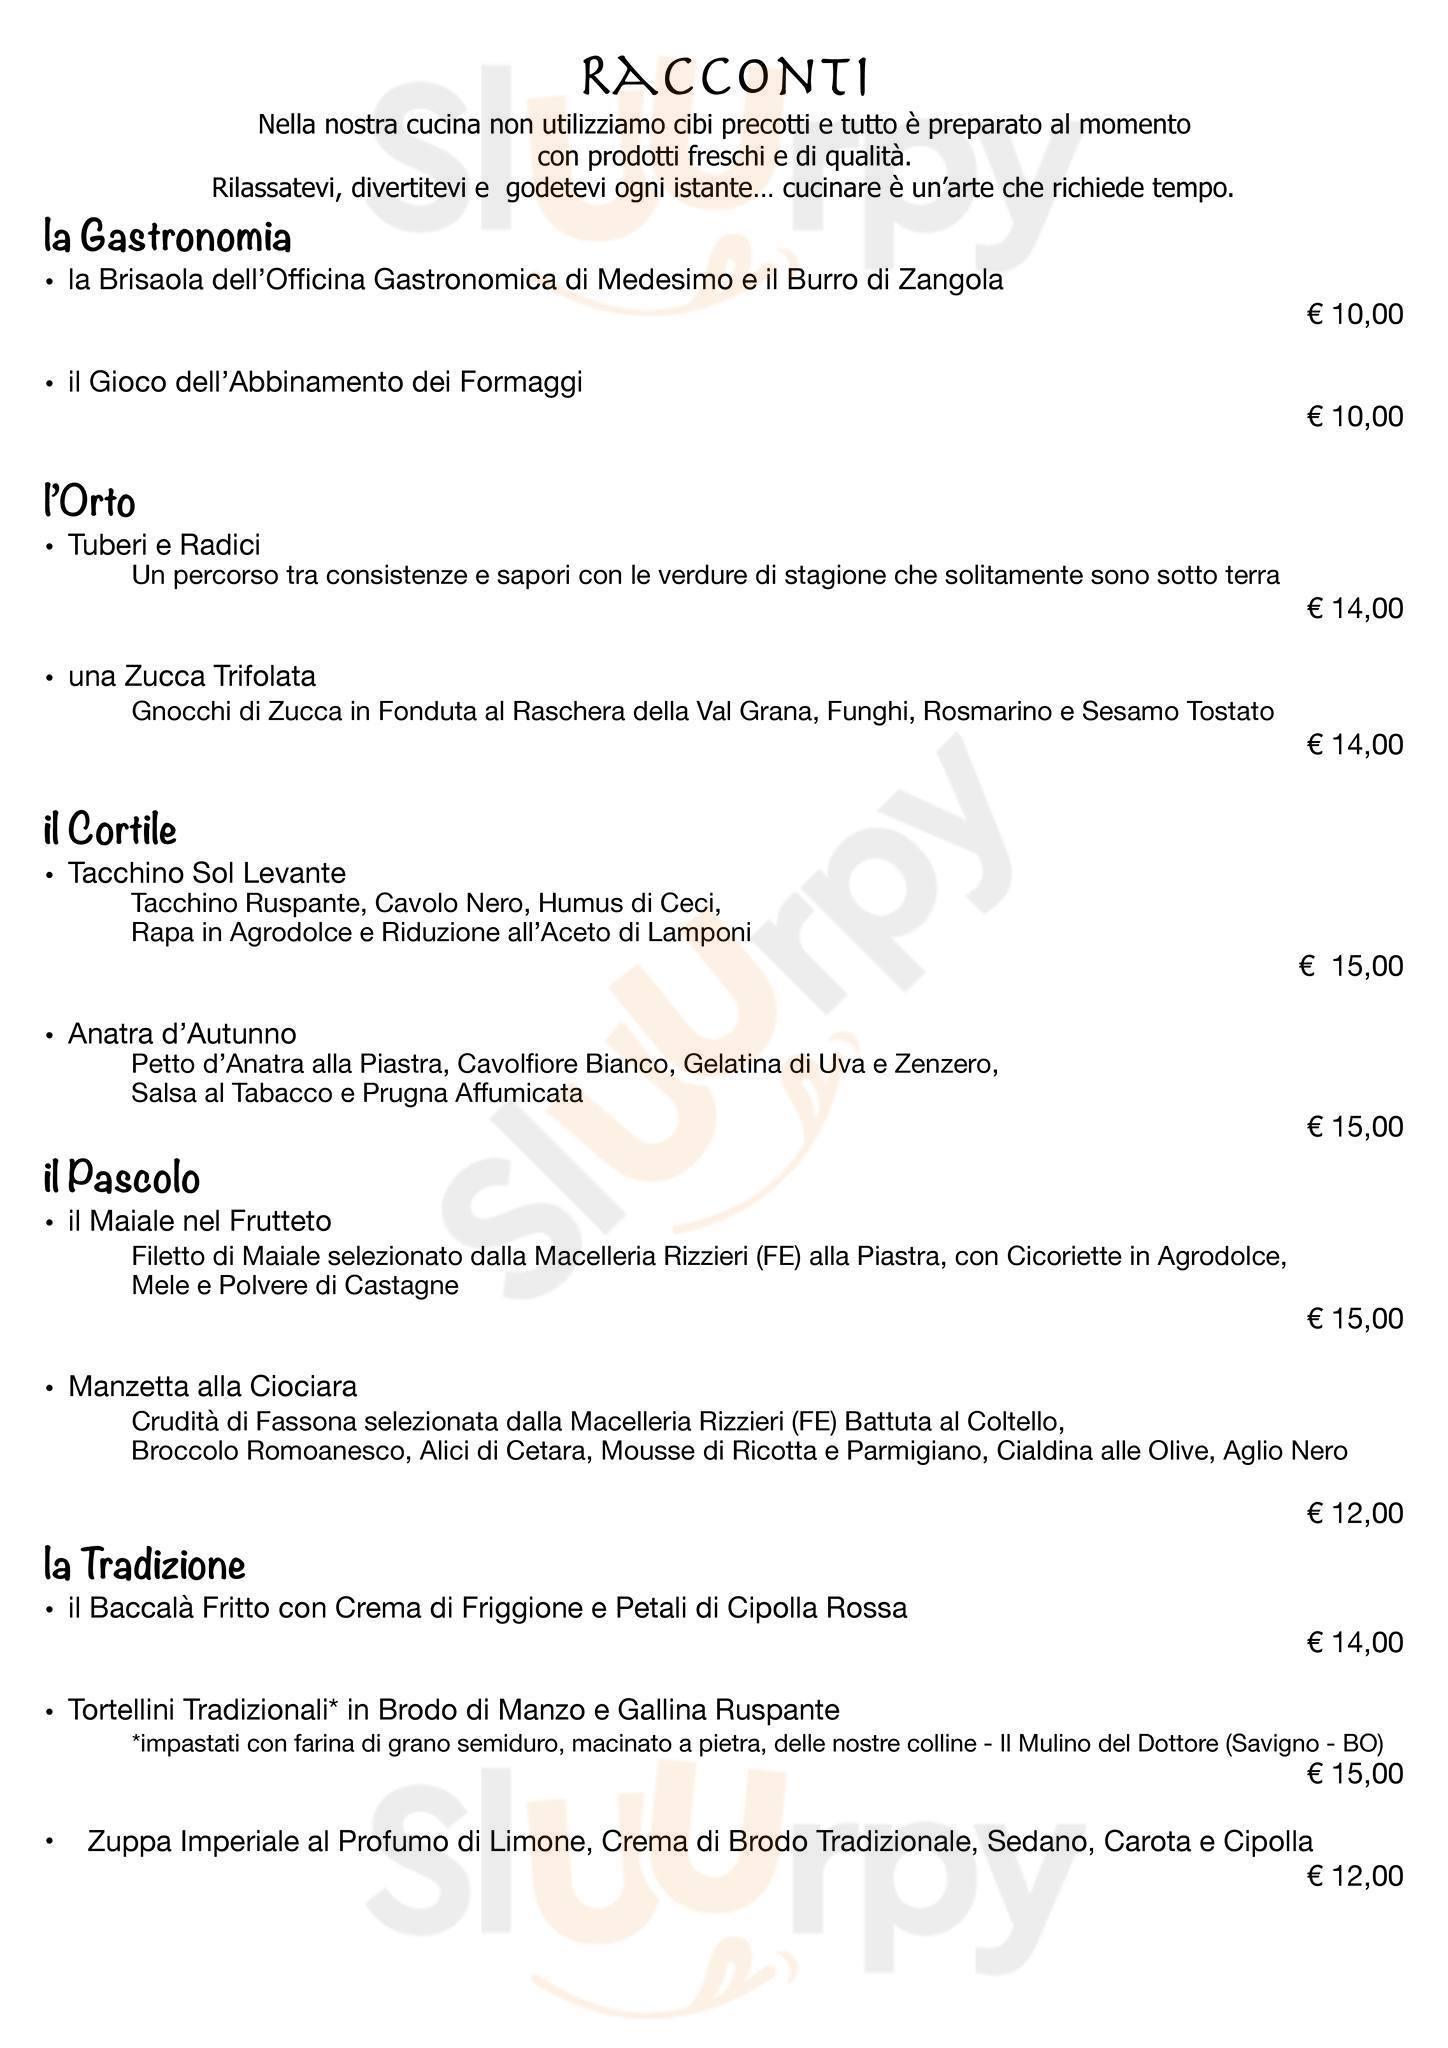 Giro di Vite Ragusa menù 1 pagina